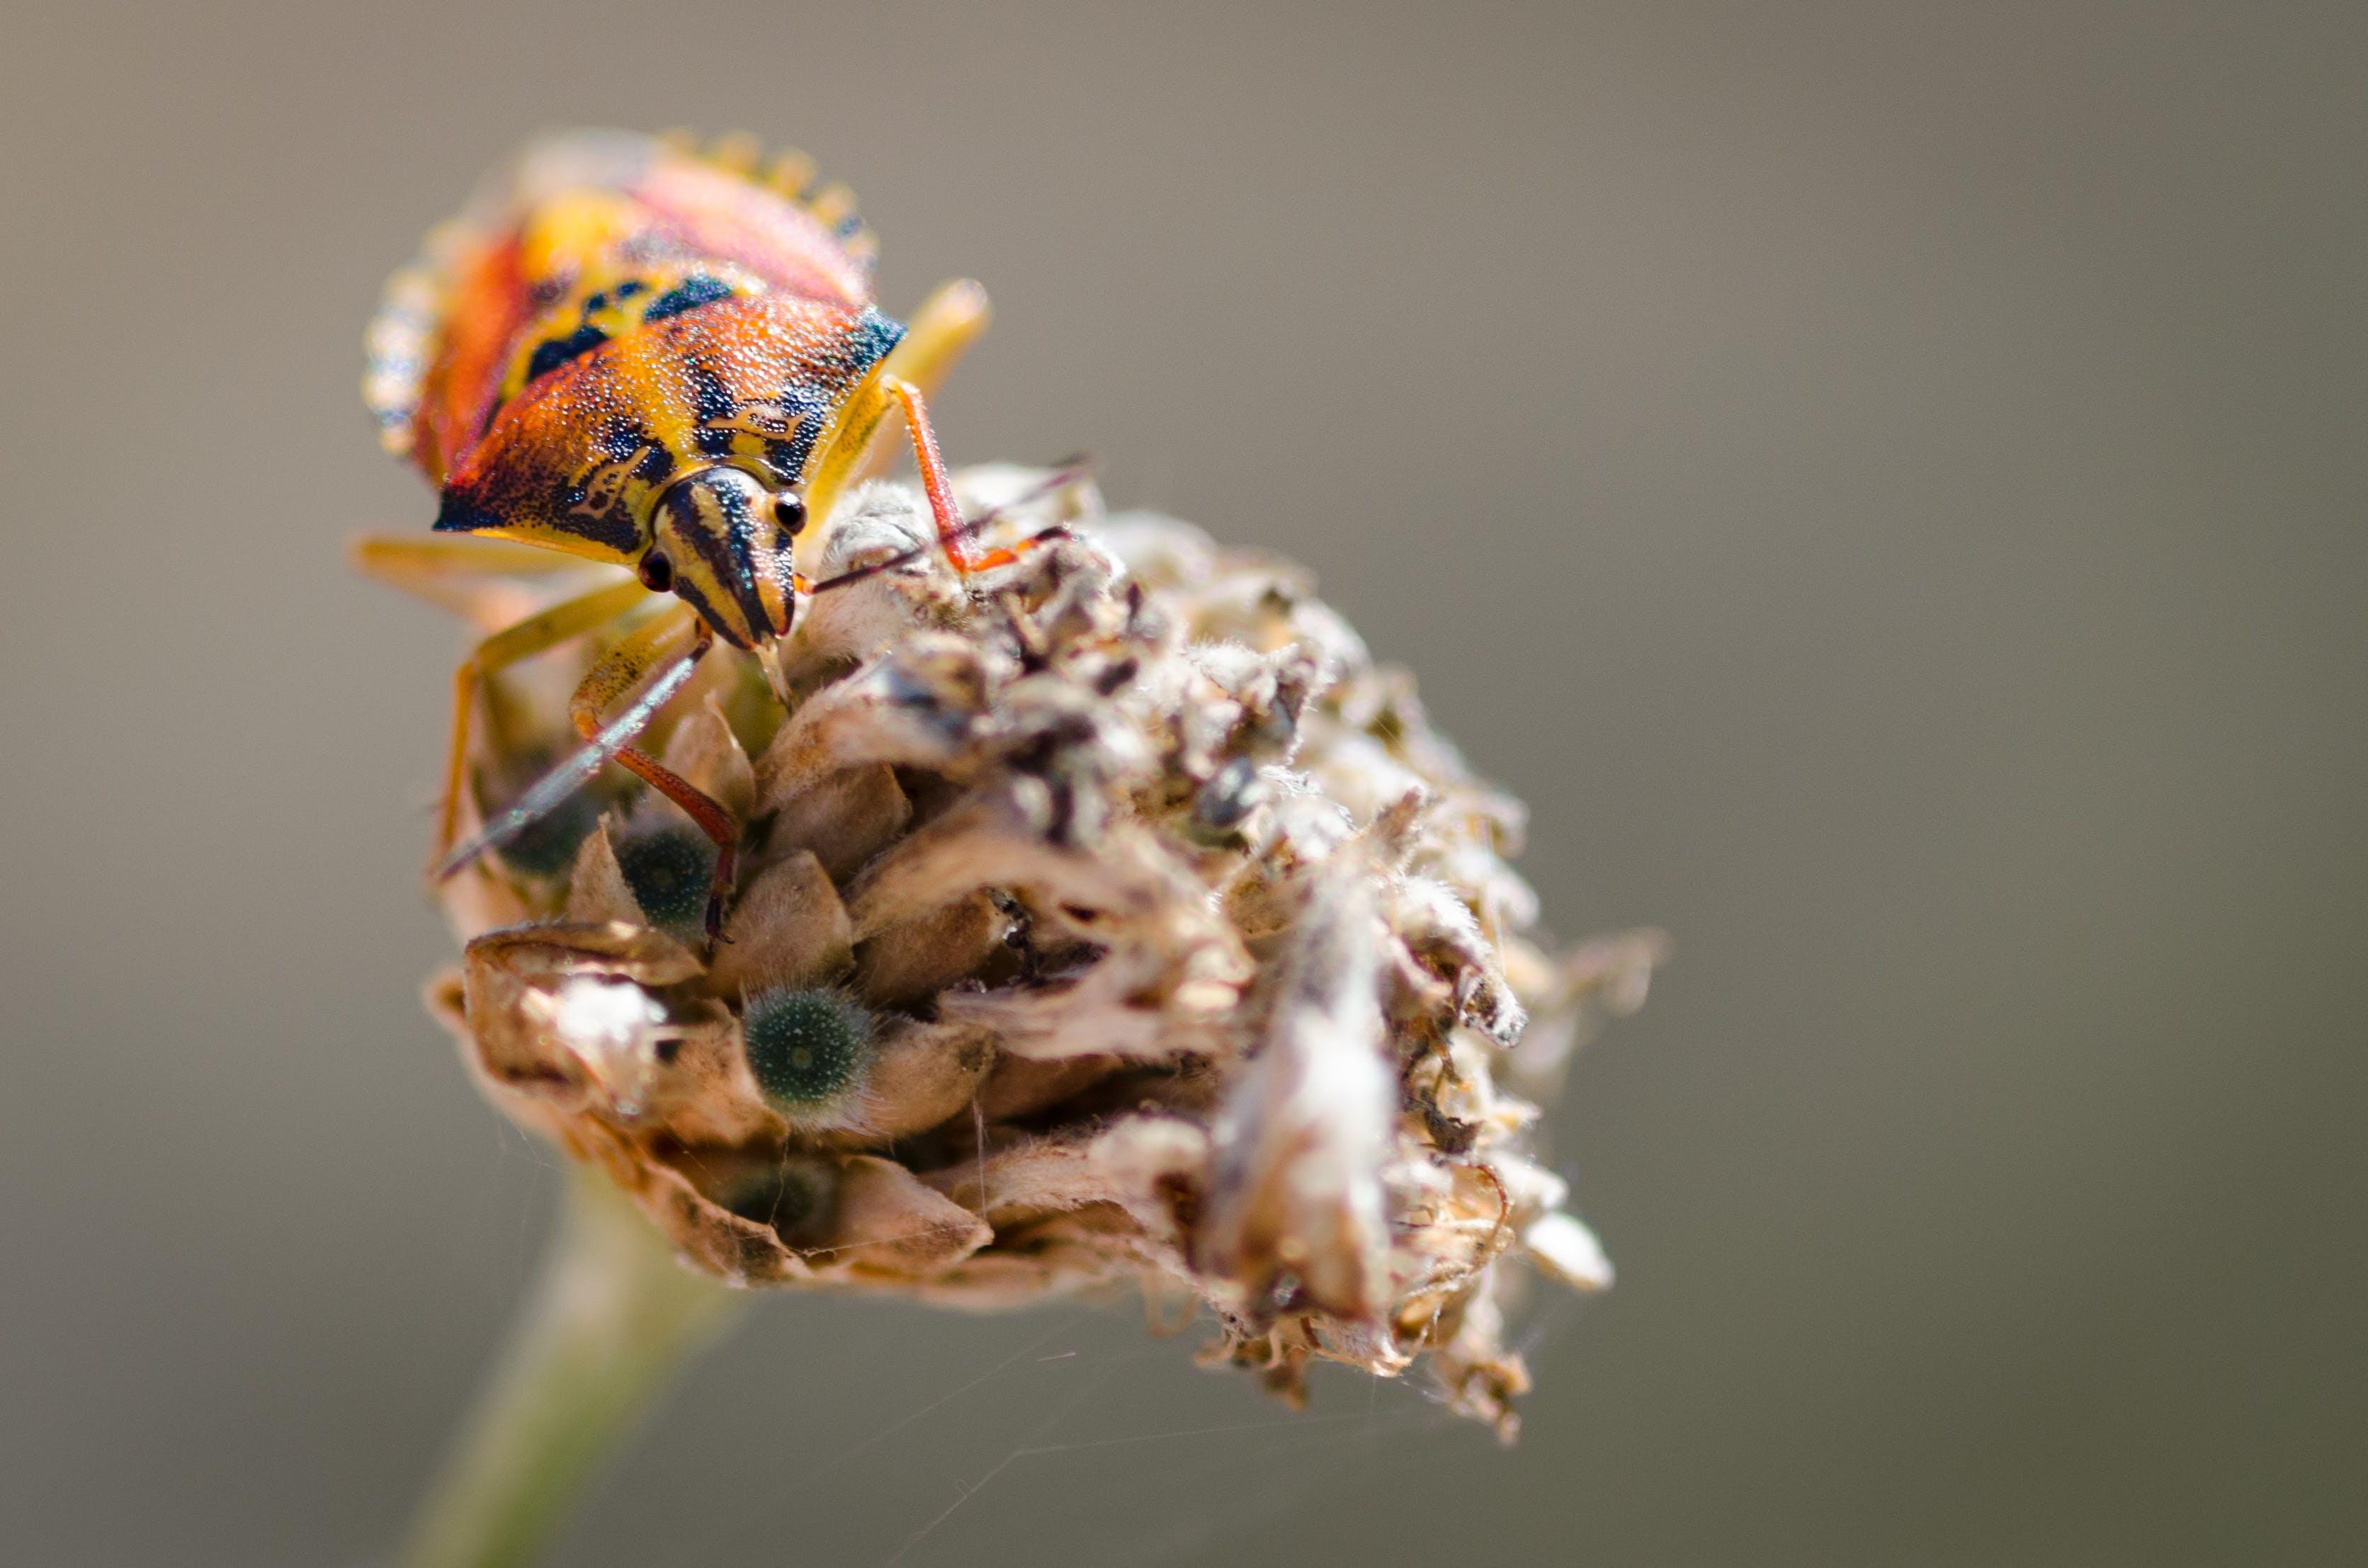 Free stock photo of nature, animal, orange, insect